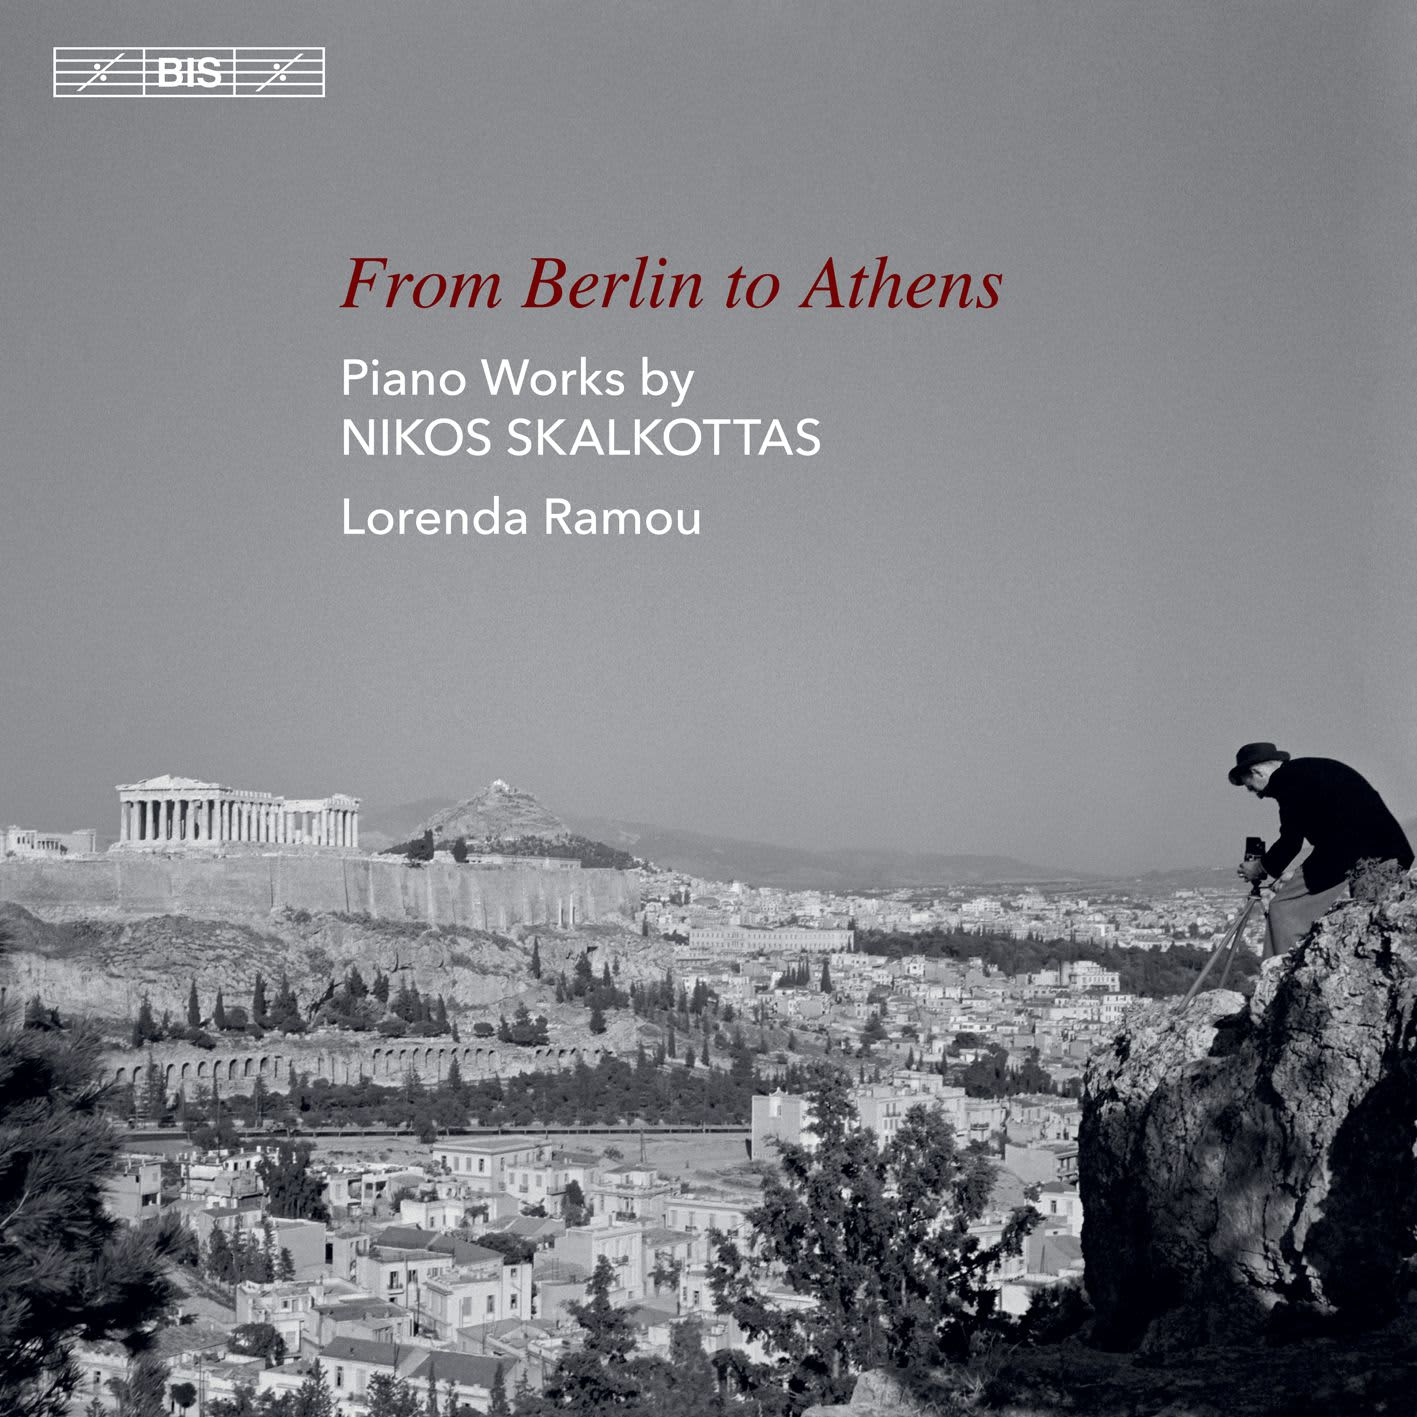 Photo No.1 of Nikos Skalkottas Piano Music: From Berlin to Athens